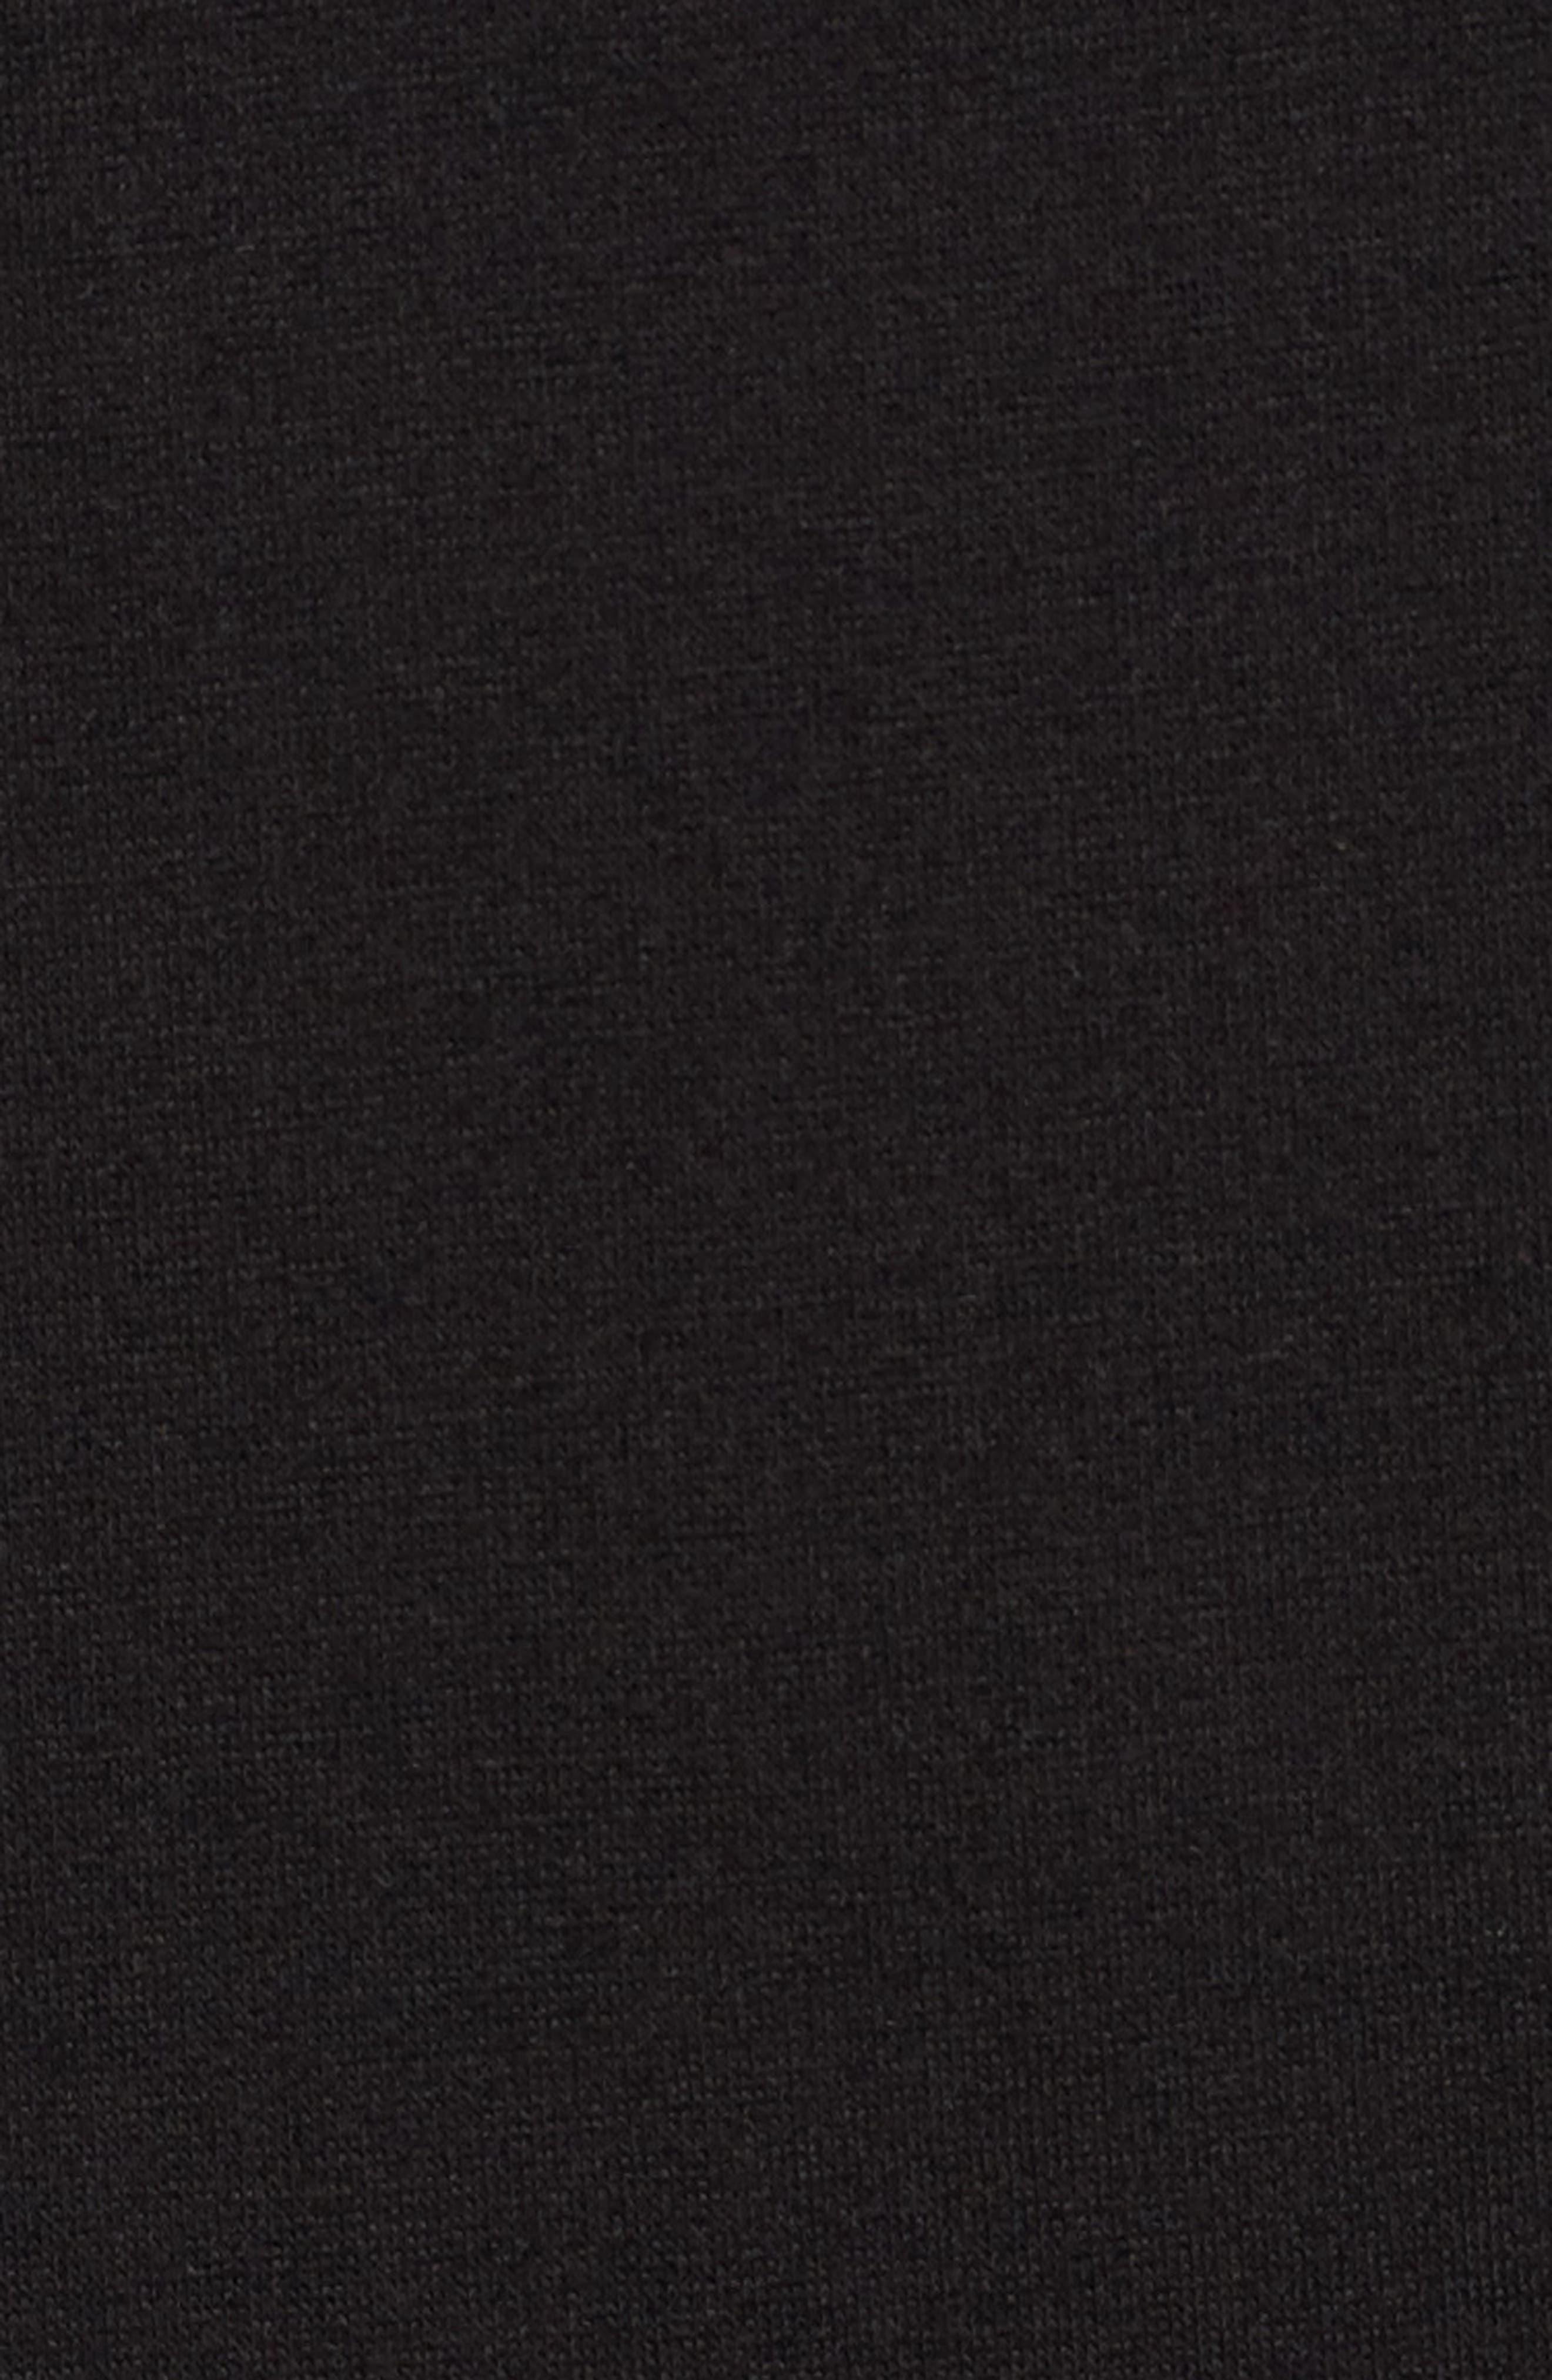 Ruffle Sleeve T-Shirt Dress,                             Alternate thumbnail 5, color,                             001